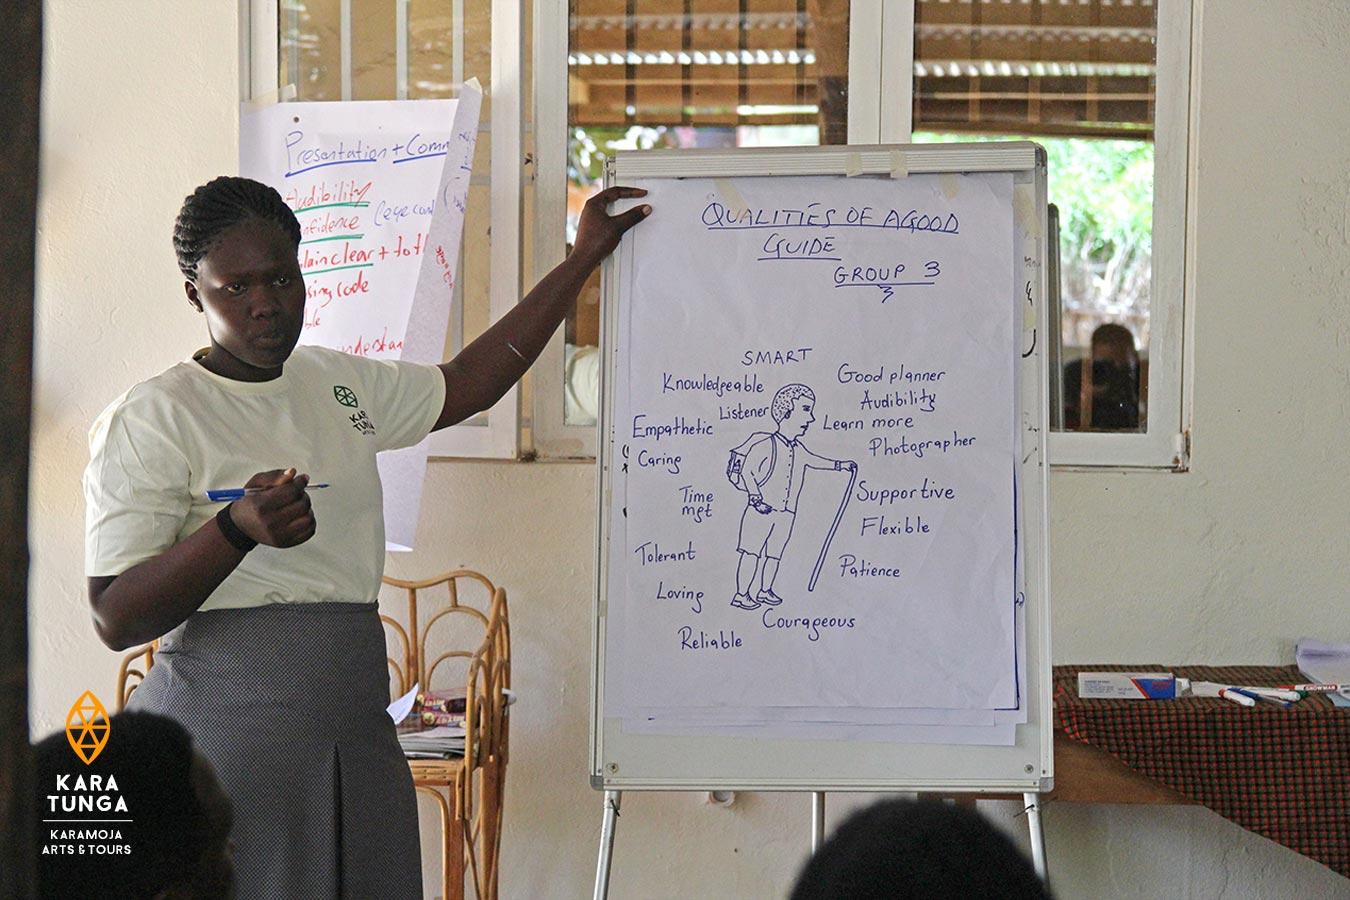 kara-tunga-undp-usaga-uwa-karamoja-uganda-tour-guides-moroto-training